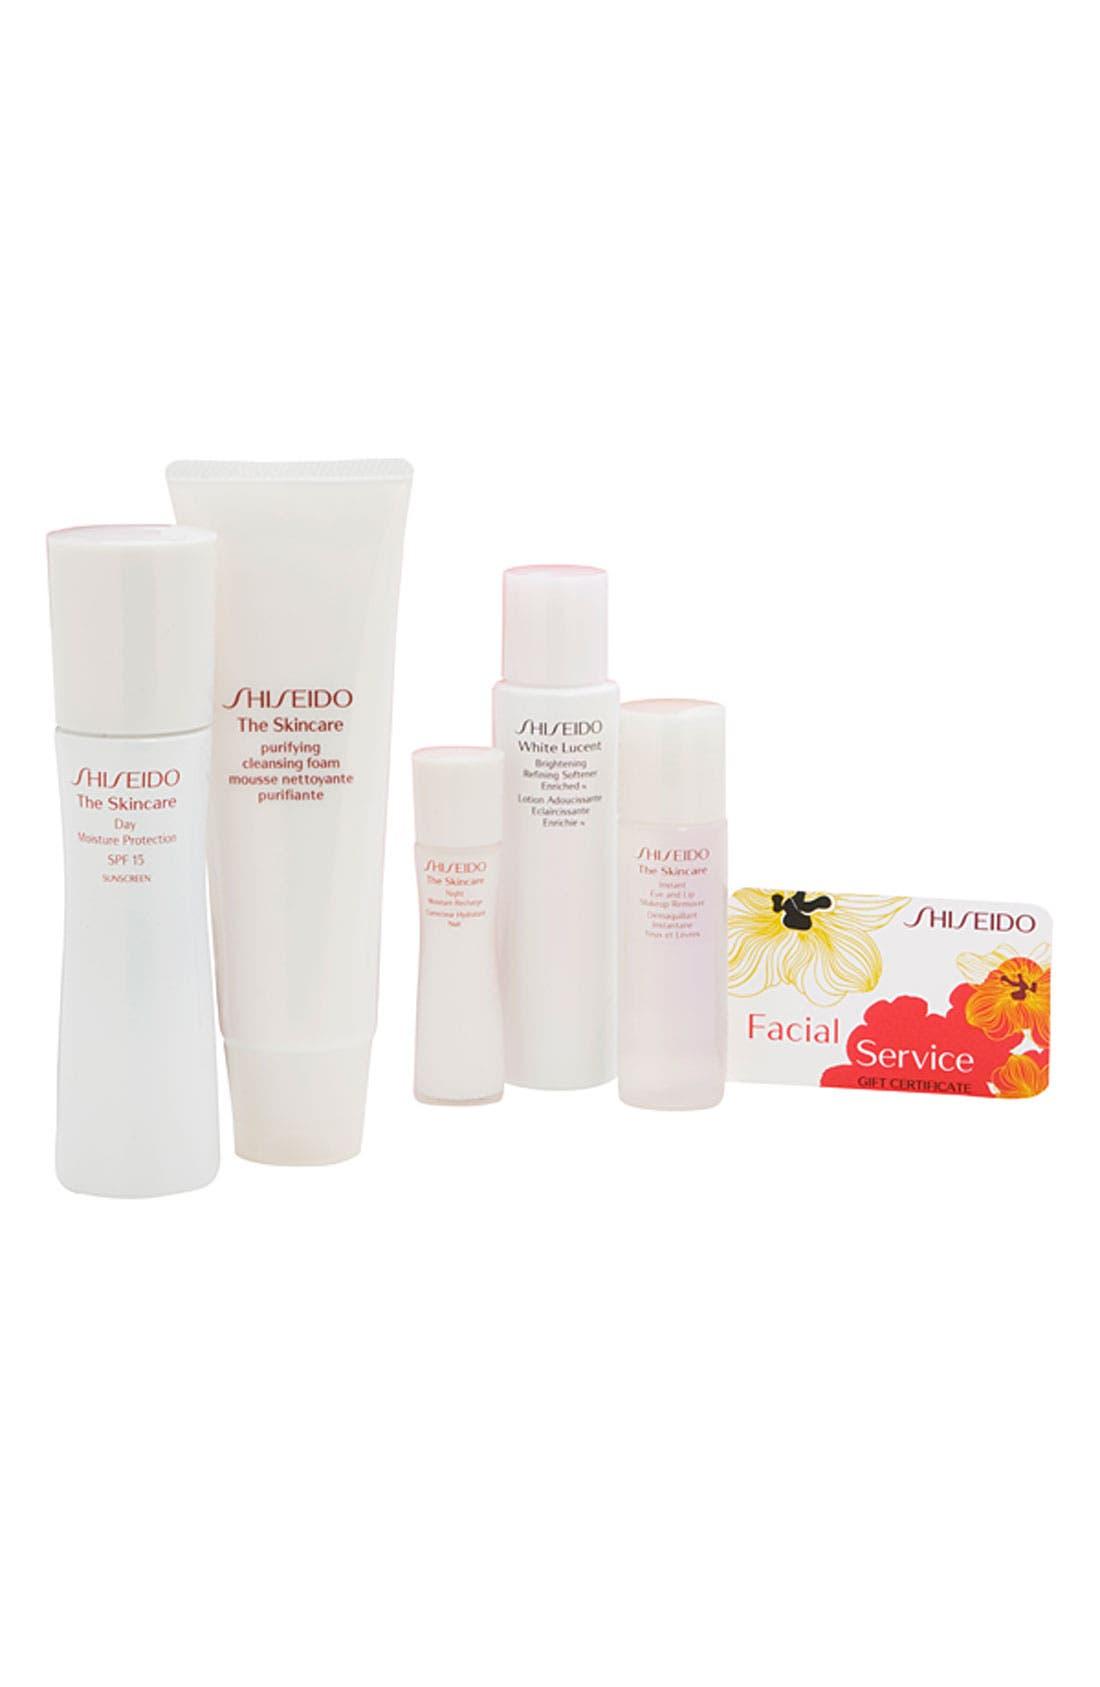 Alternate Image 1 Selected - Shiseido 'The Skincare' Complete Moisture Set ($102 Value)